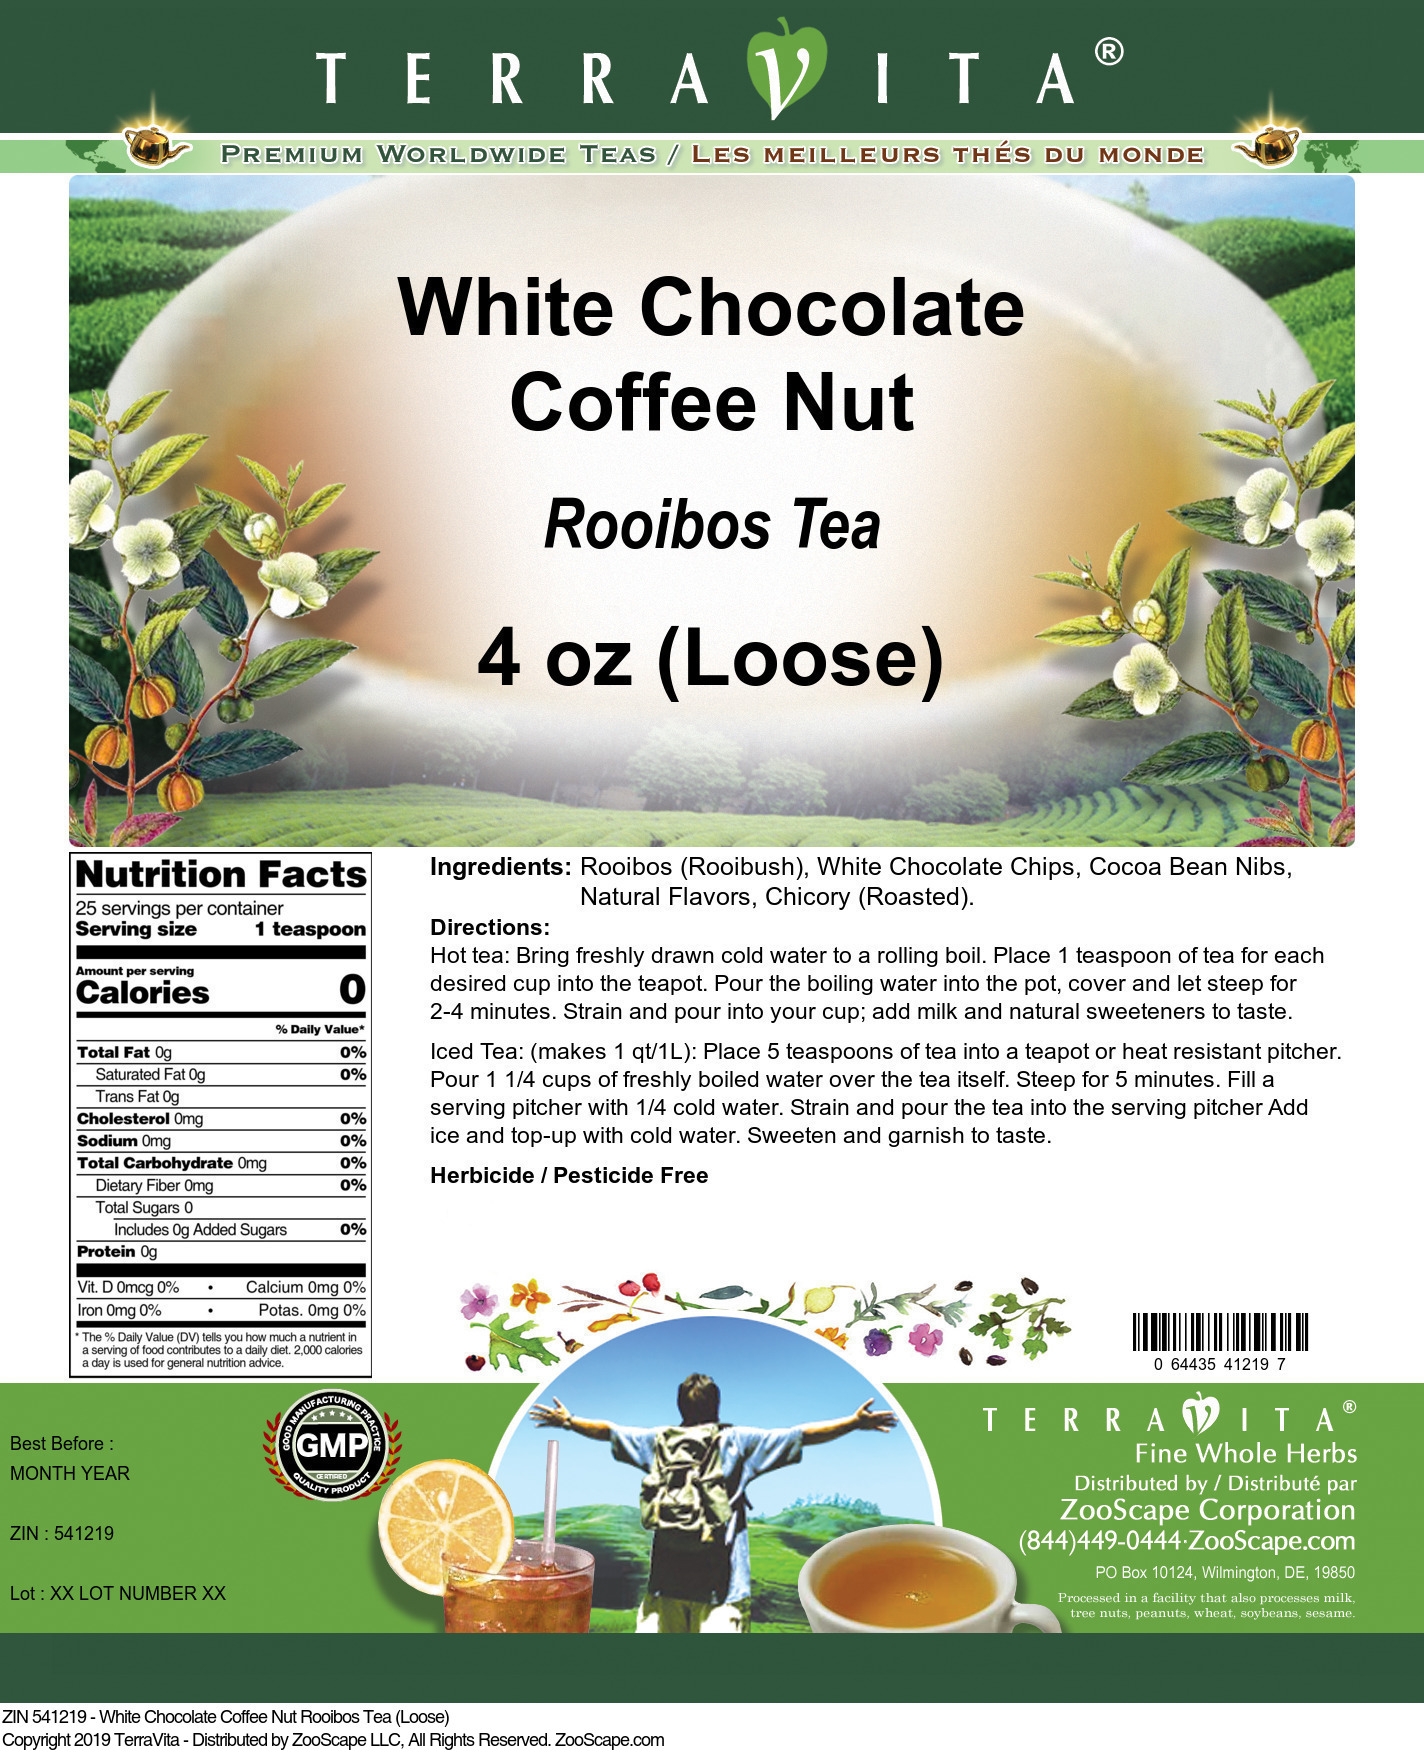 White Chocolate Coffee Nut Rooibos Tea (Loose)